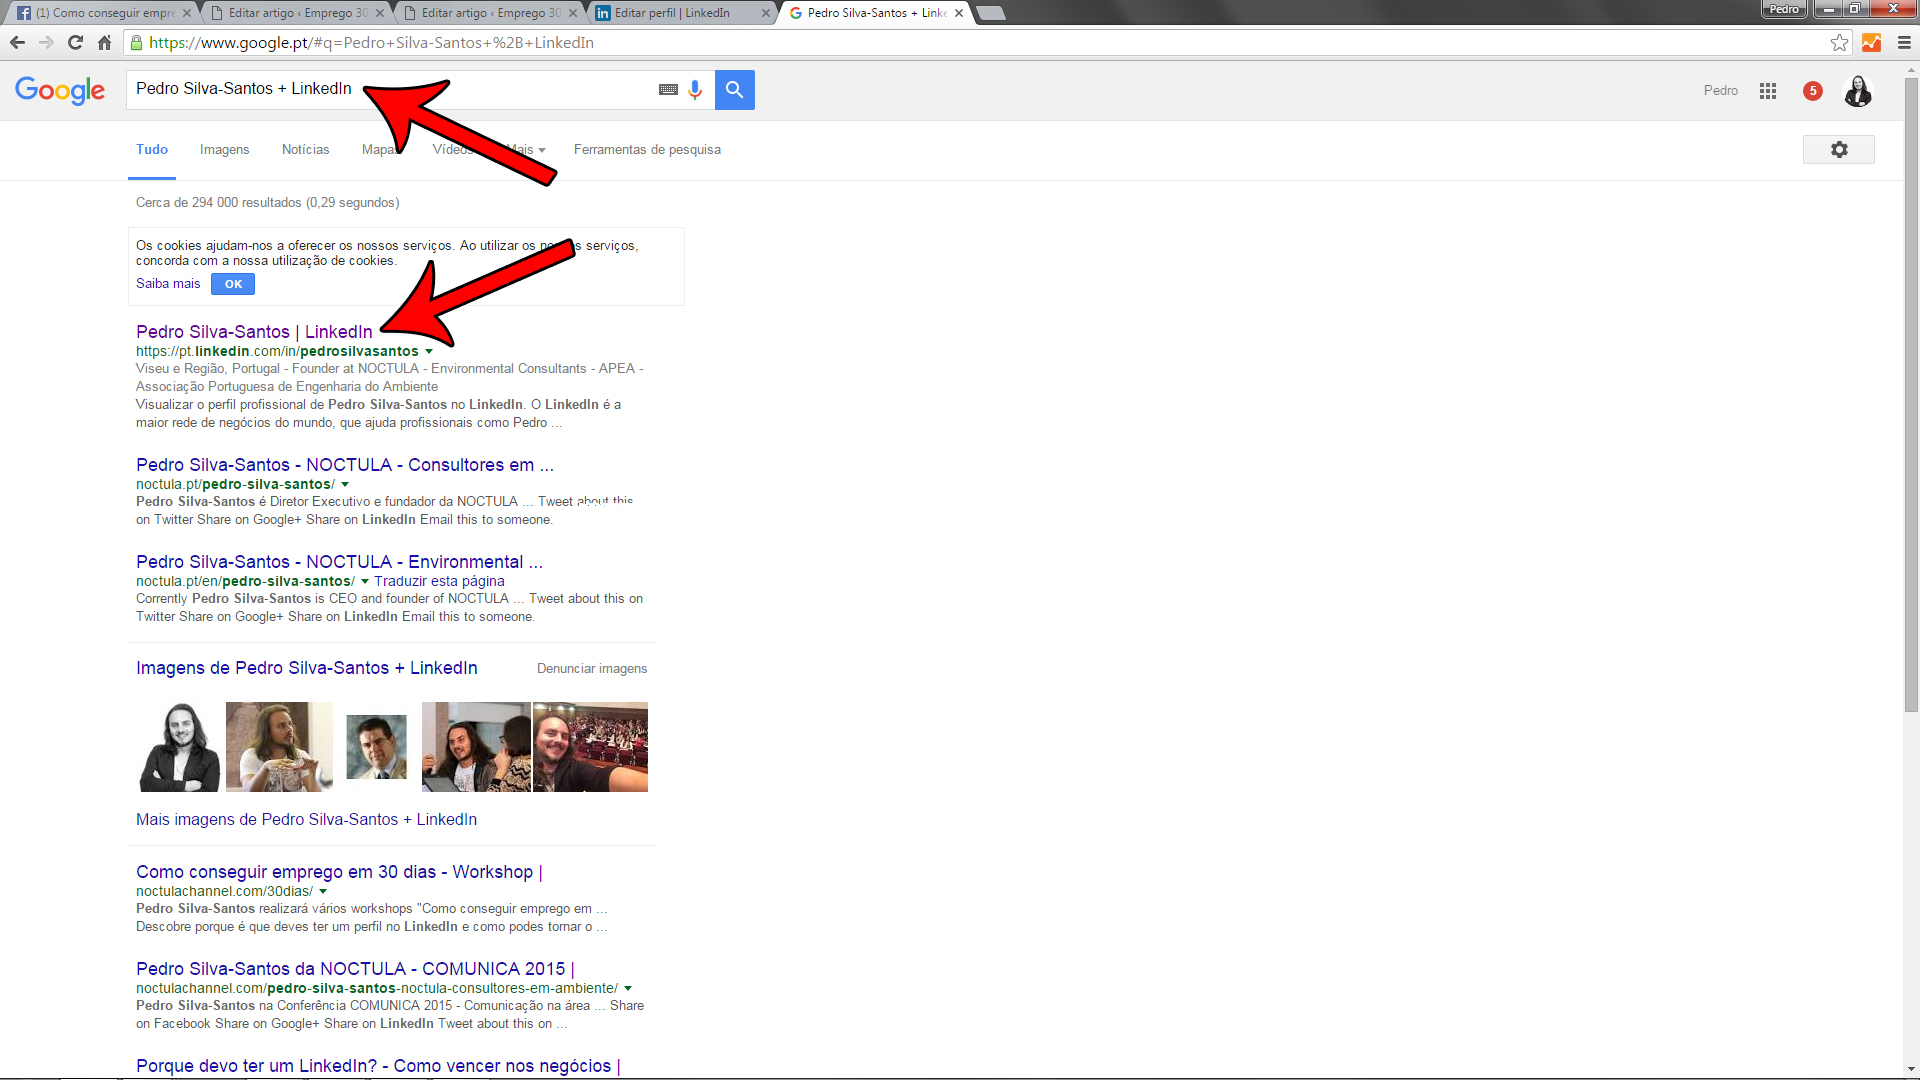 procurar perfis LinkedIn no Google